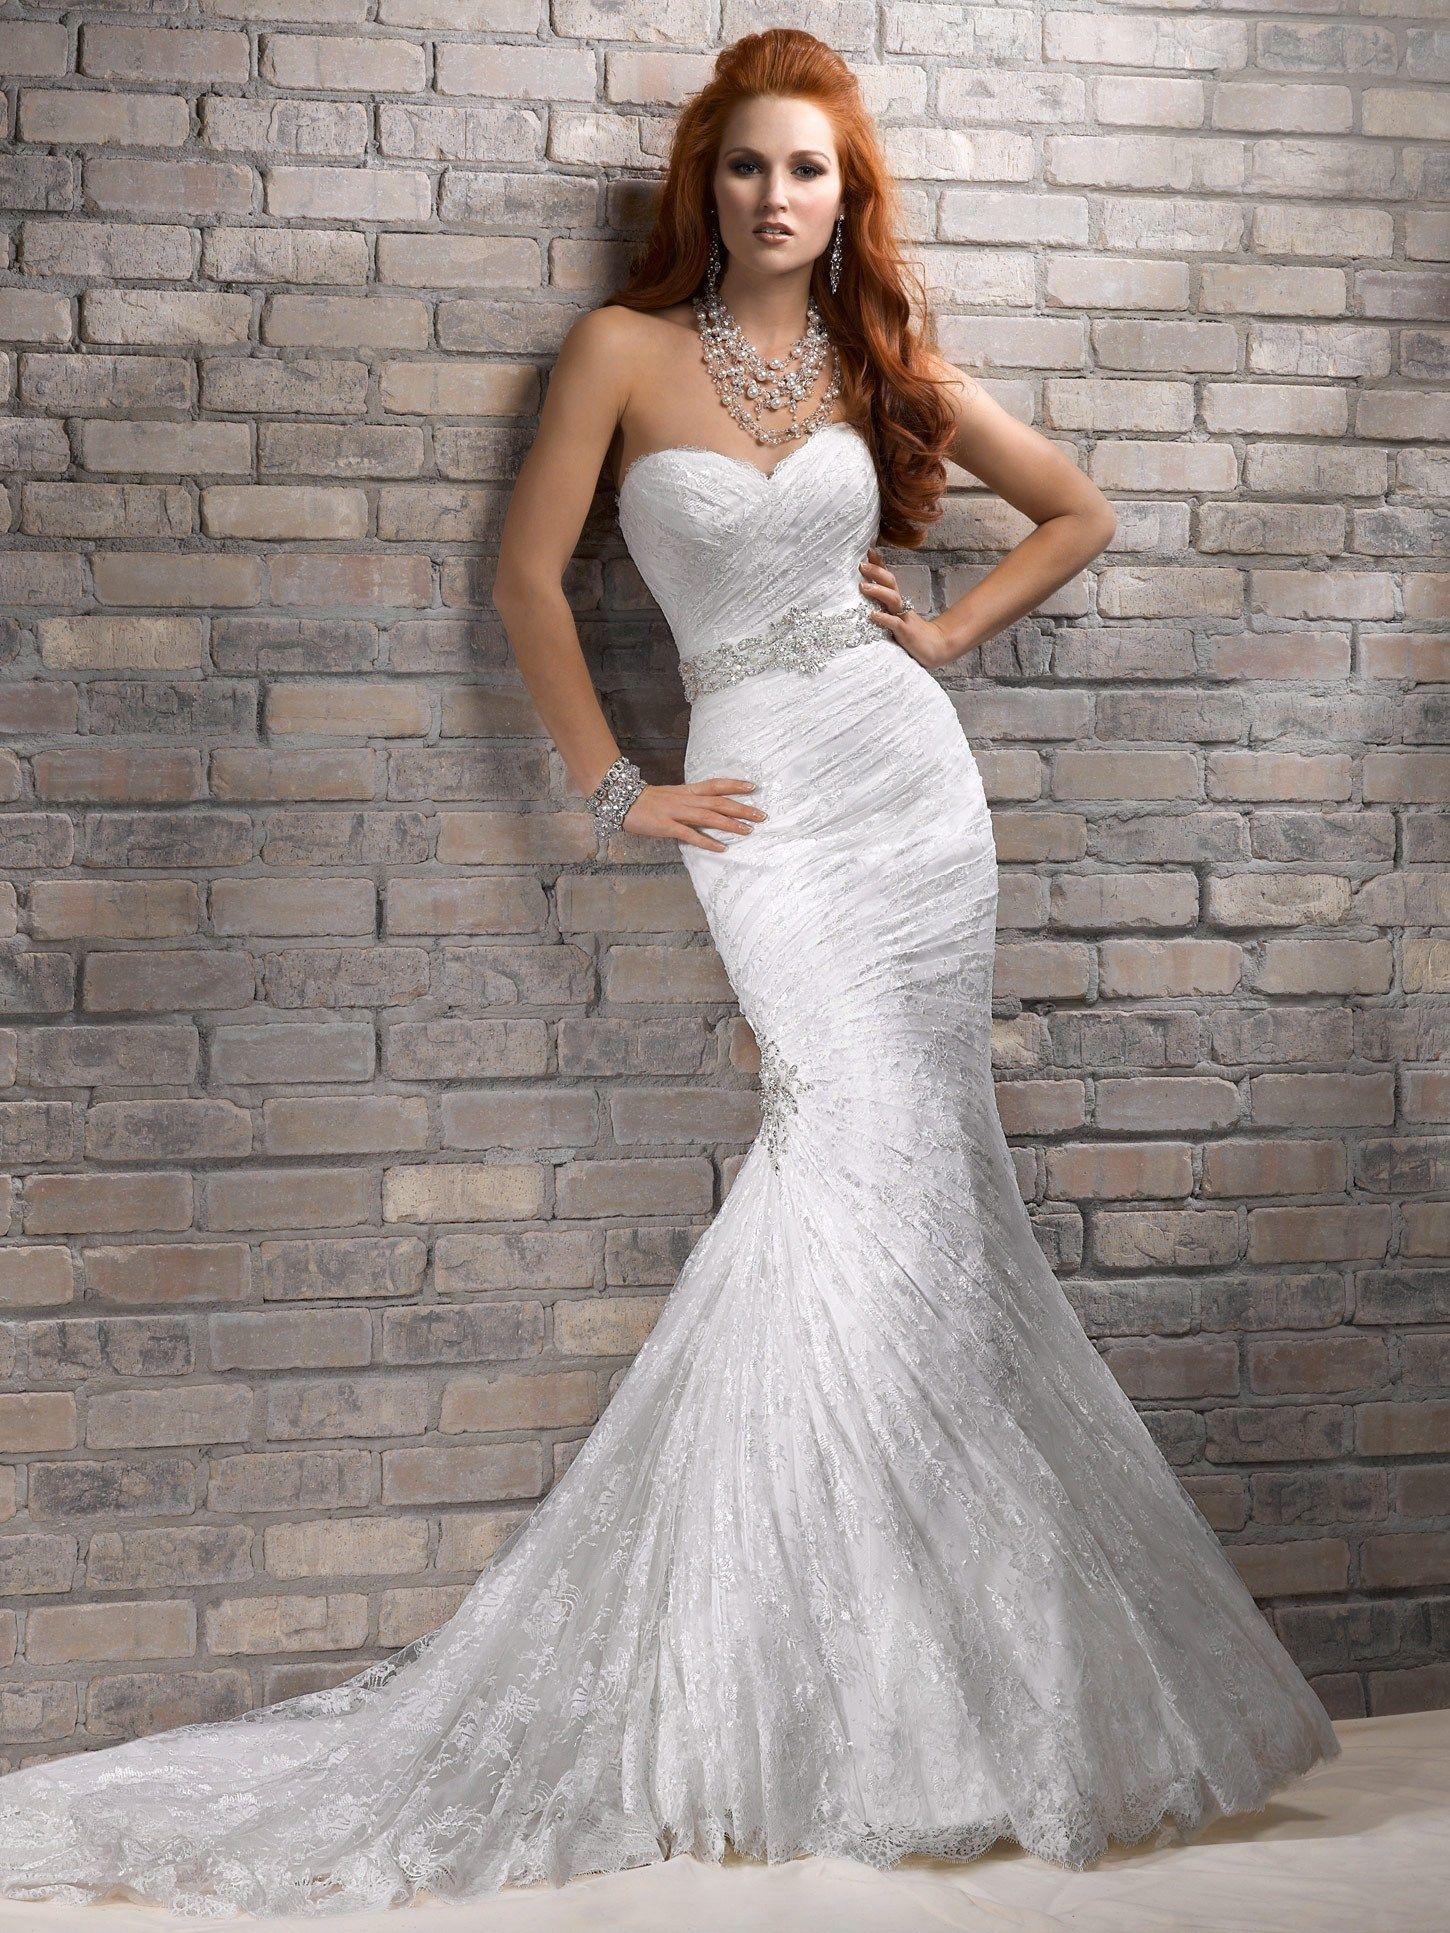 57 Lovely Corset Mermaid Wedding Dress Pics Wedding Dress Gal Wedding Dresses Mermaid Sweetheart Corset Mermaid Wedding Dress Strapless Wedding Dress Mermaid [ 1933 x 1450 Pixel ]